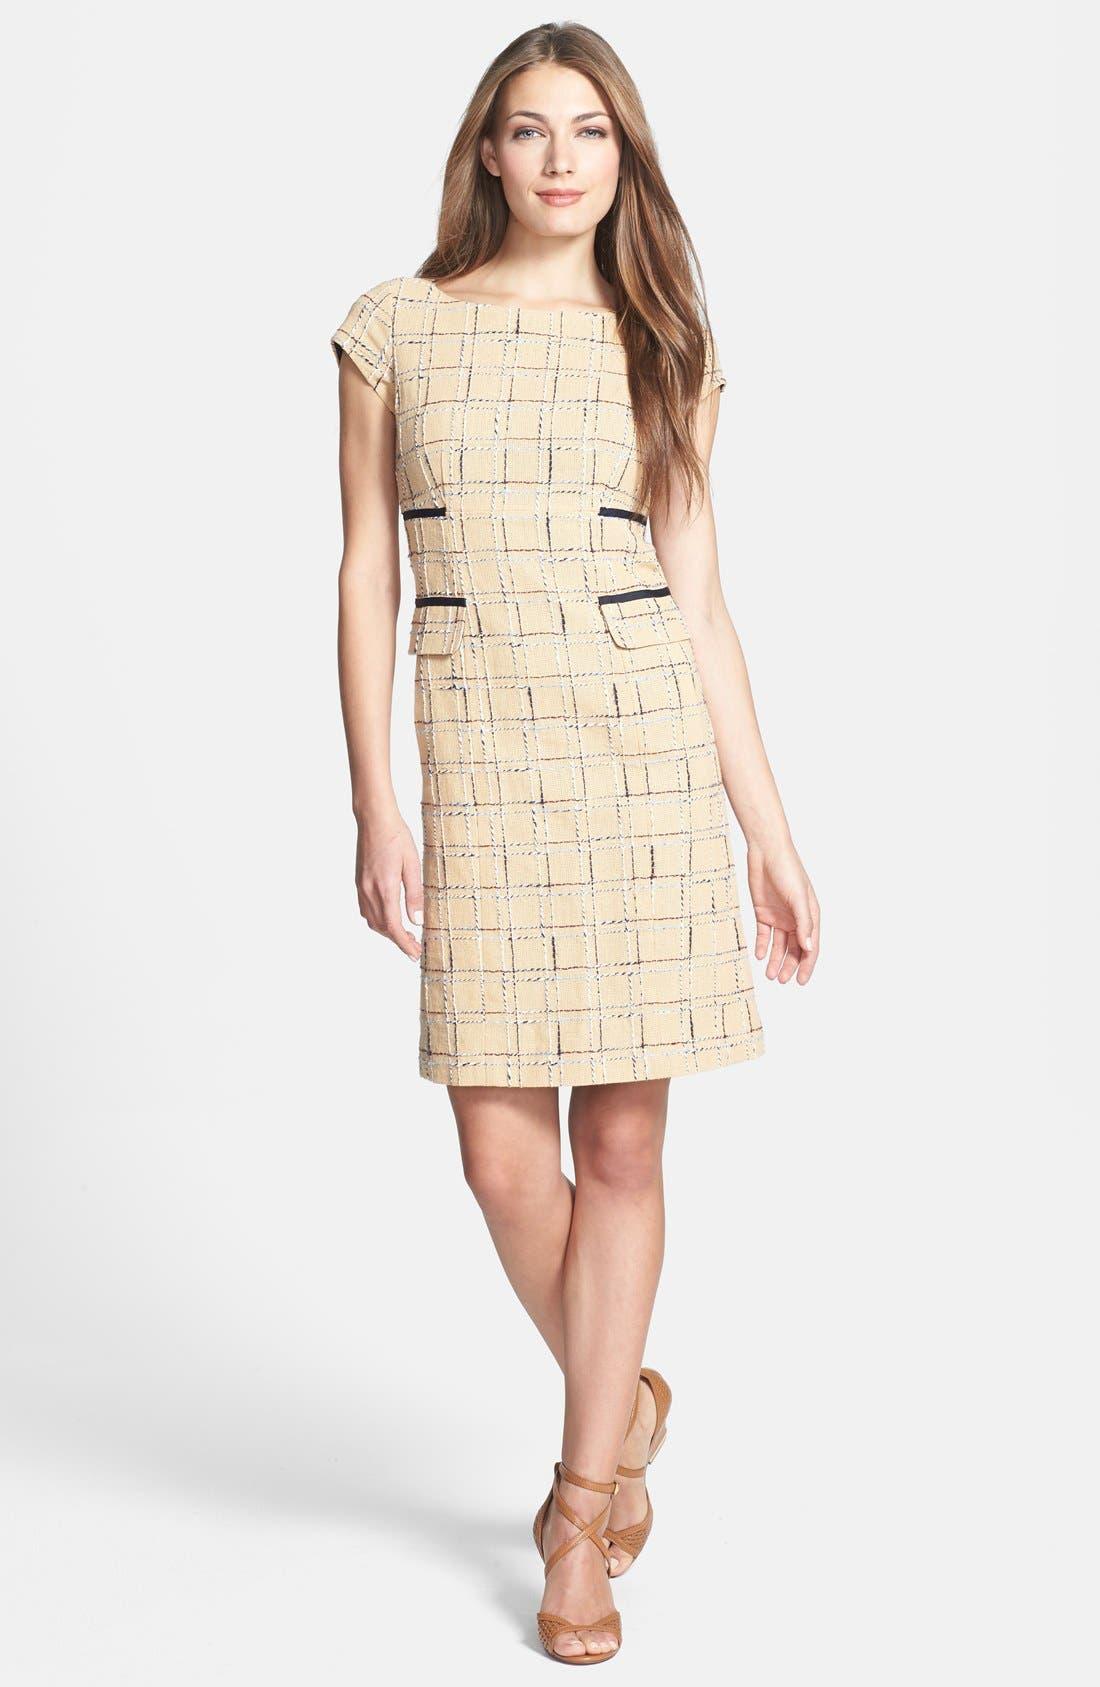 Main Image - Tory Burch 'Evie' Woven Cotton & Linen Sheath Dress